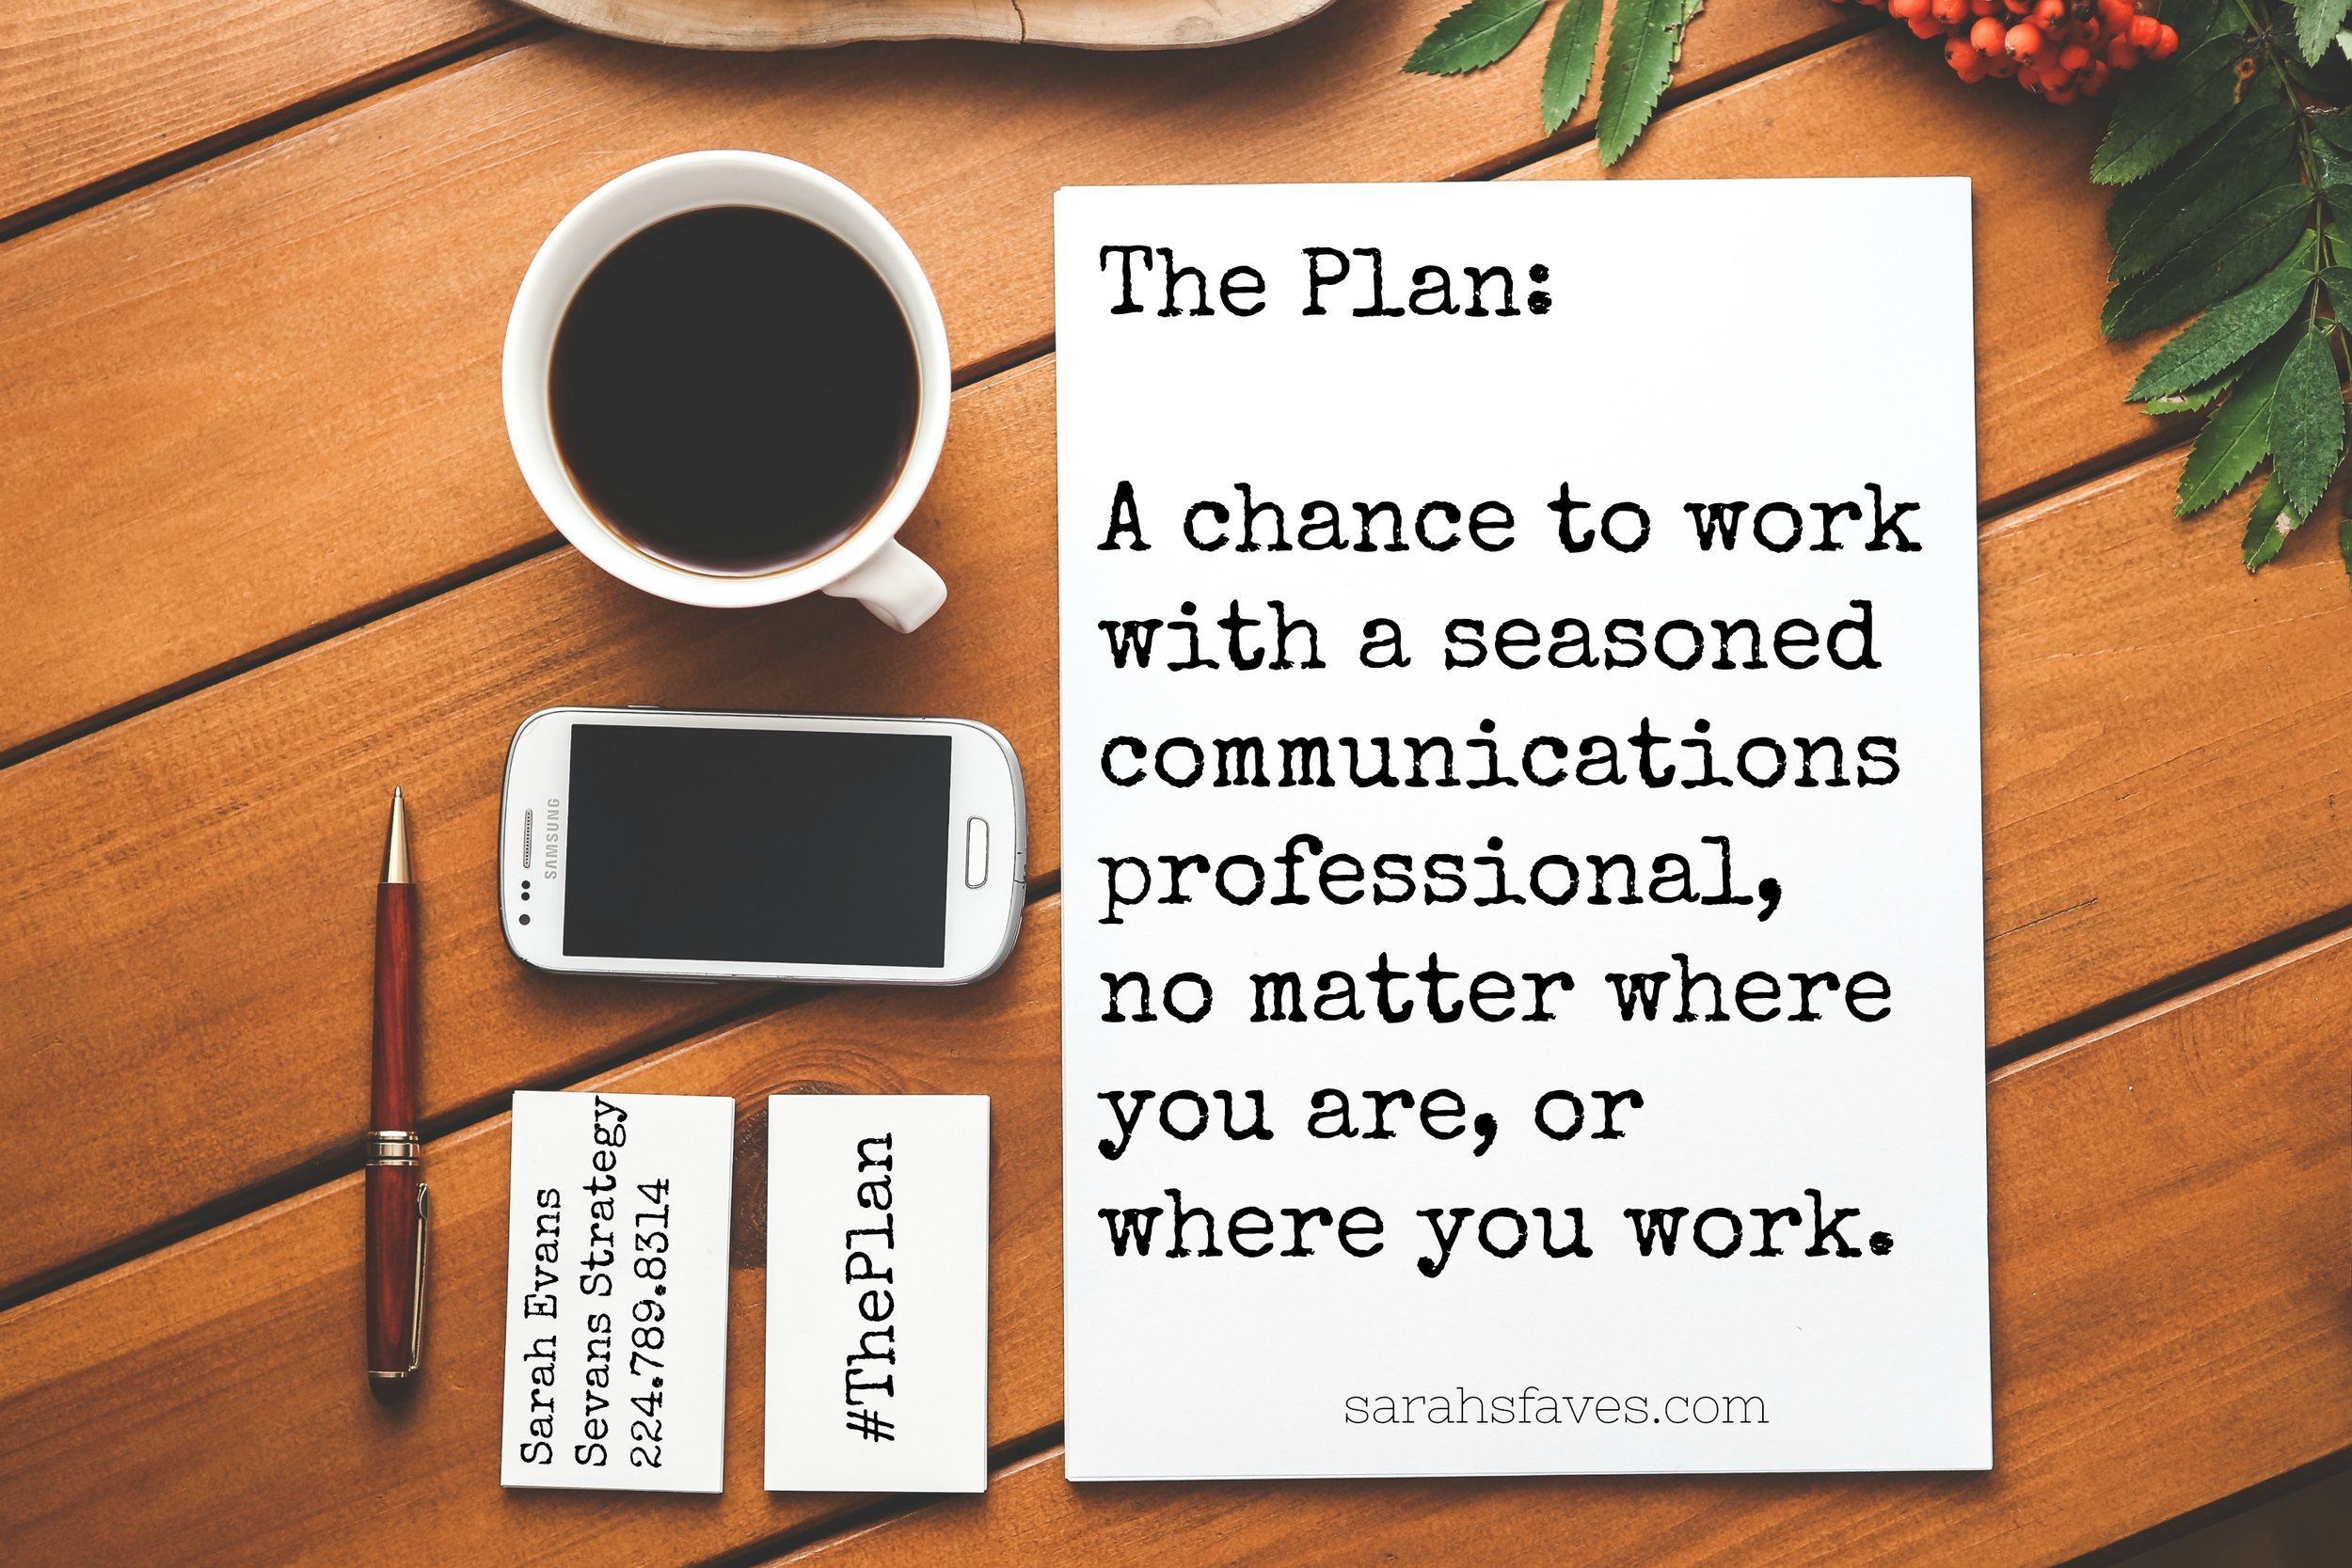 the plan visual image 1.jpg